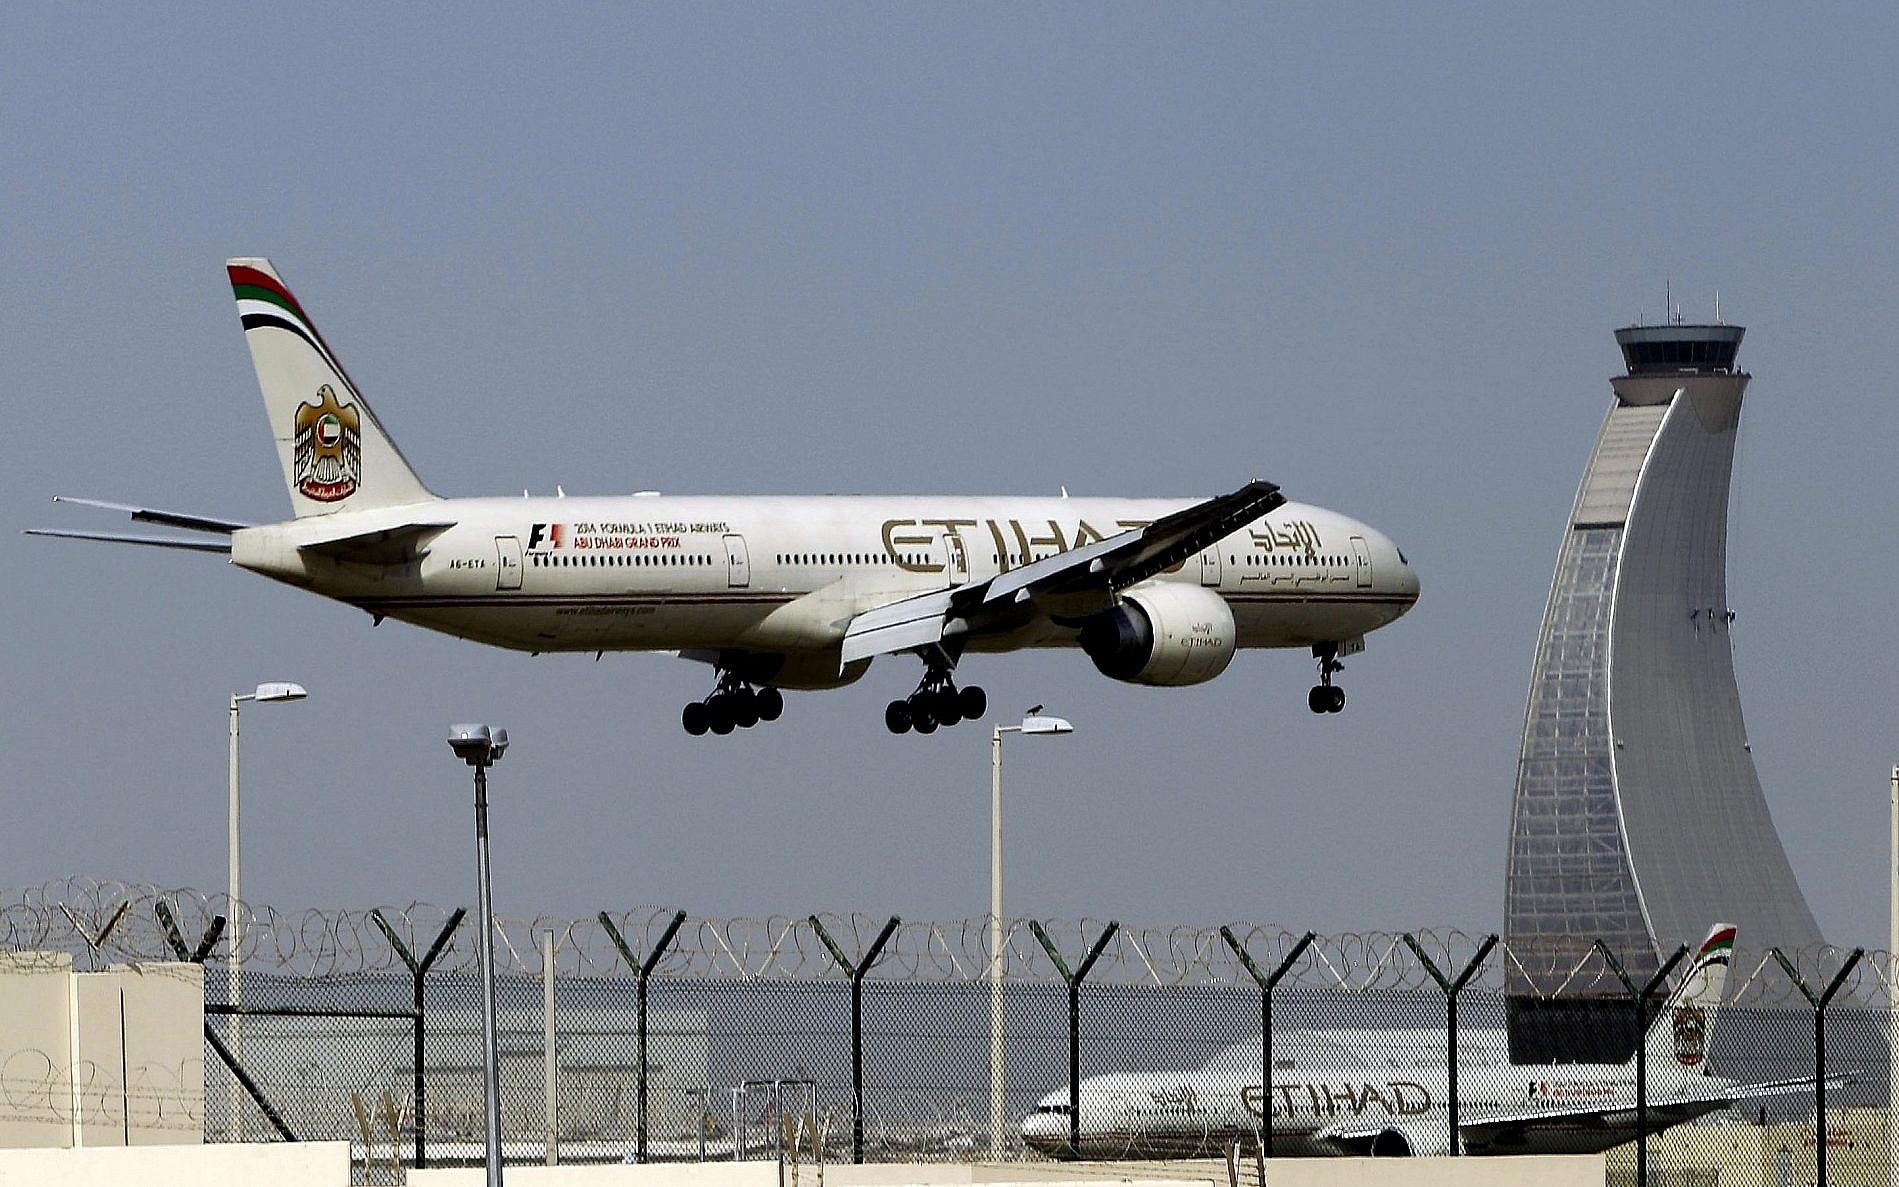 Etihad Airways grounds all UAE flights